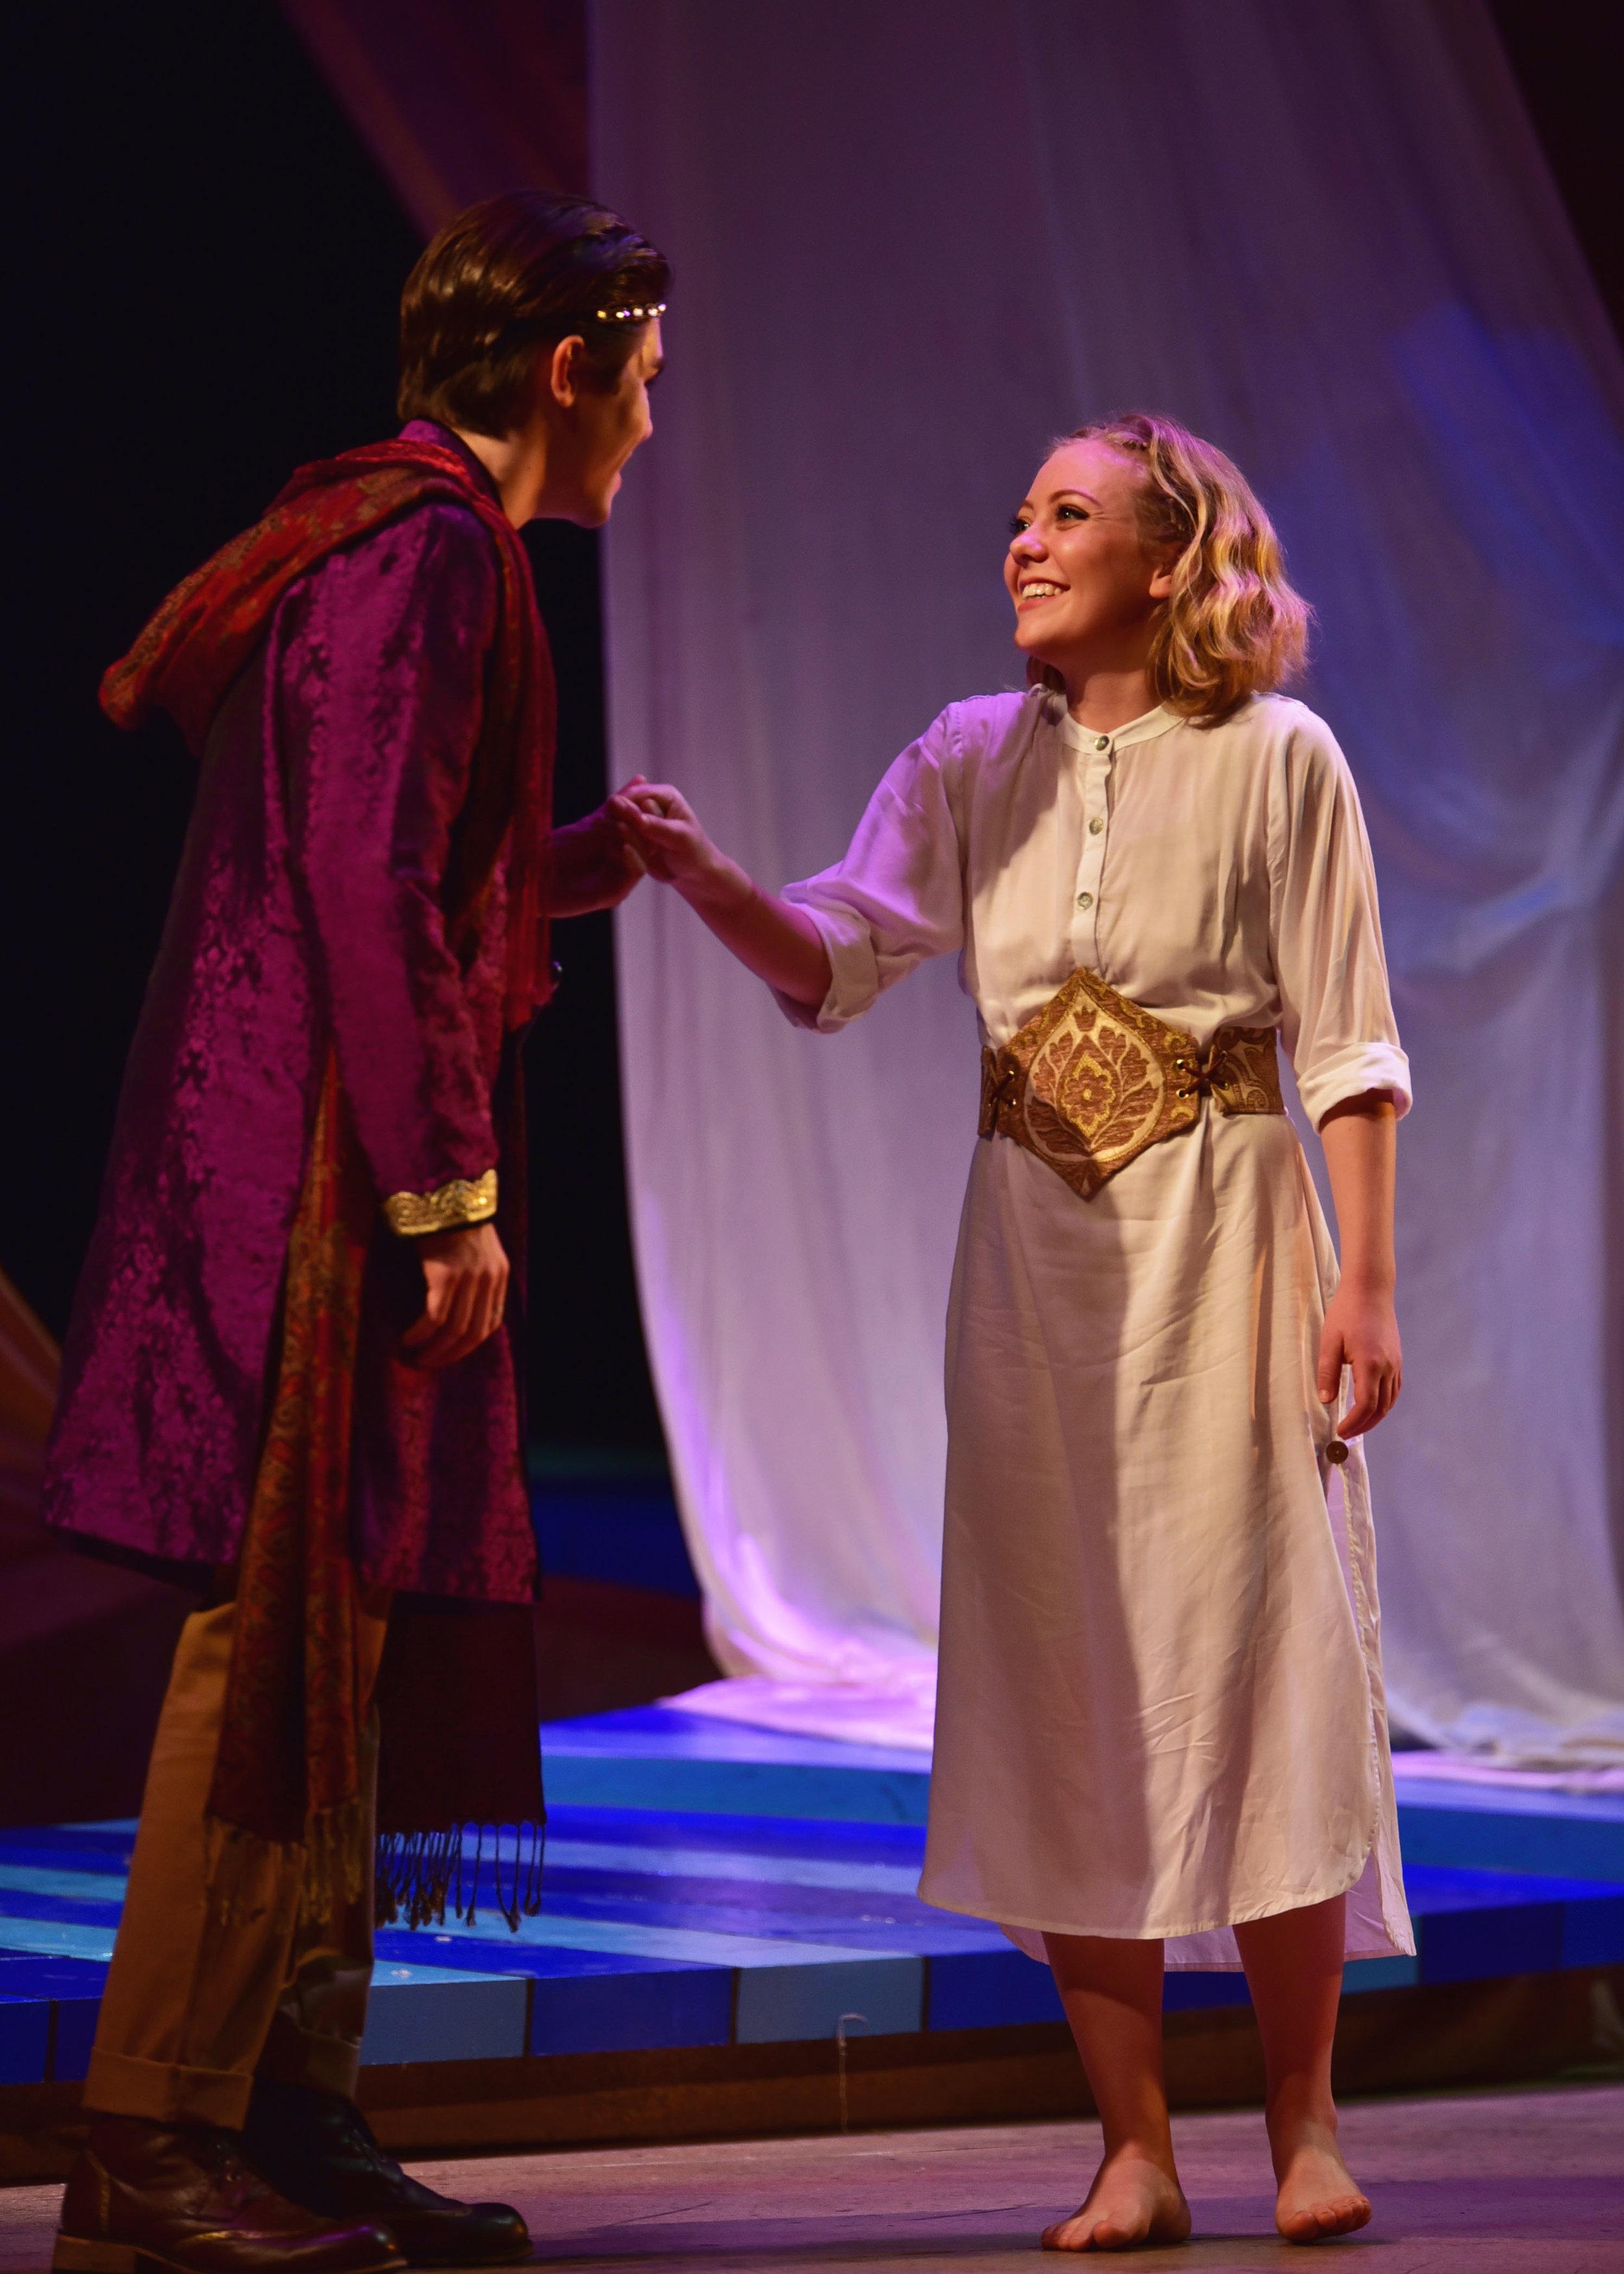 Devin May as Ferdinand and Erin Logan as Miranda. Photo by: Courtney Foxworthy